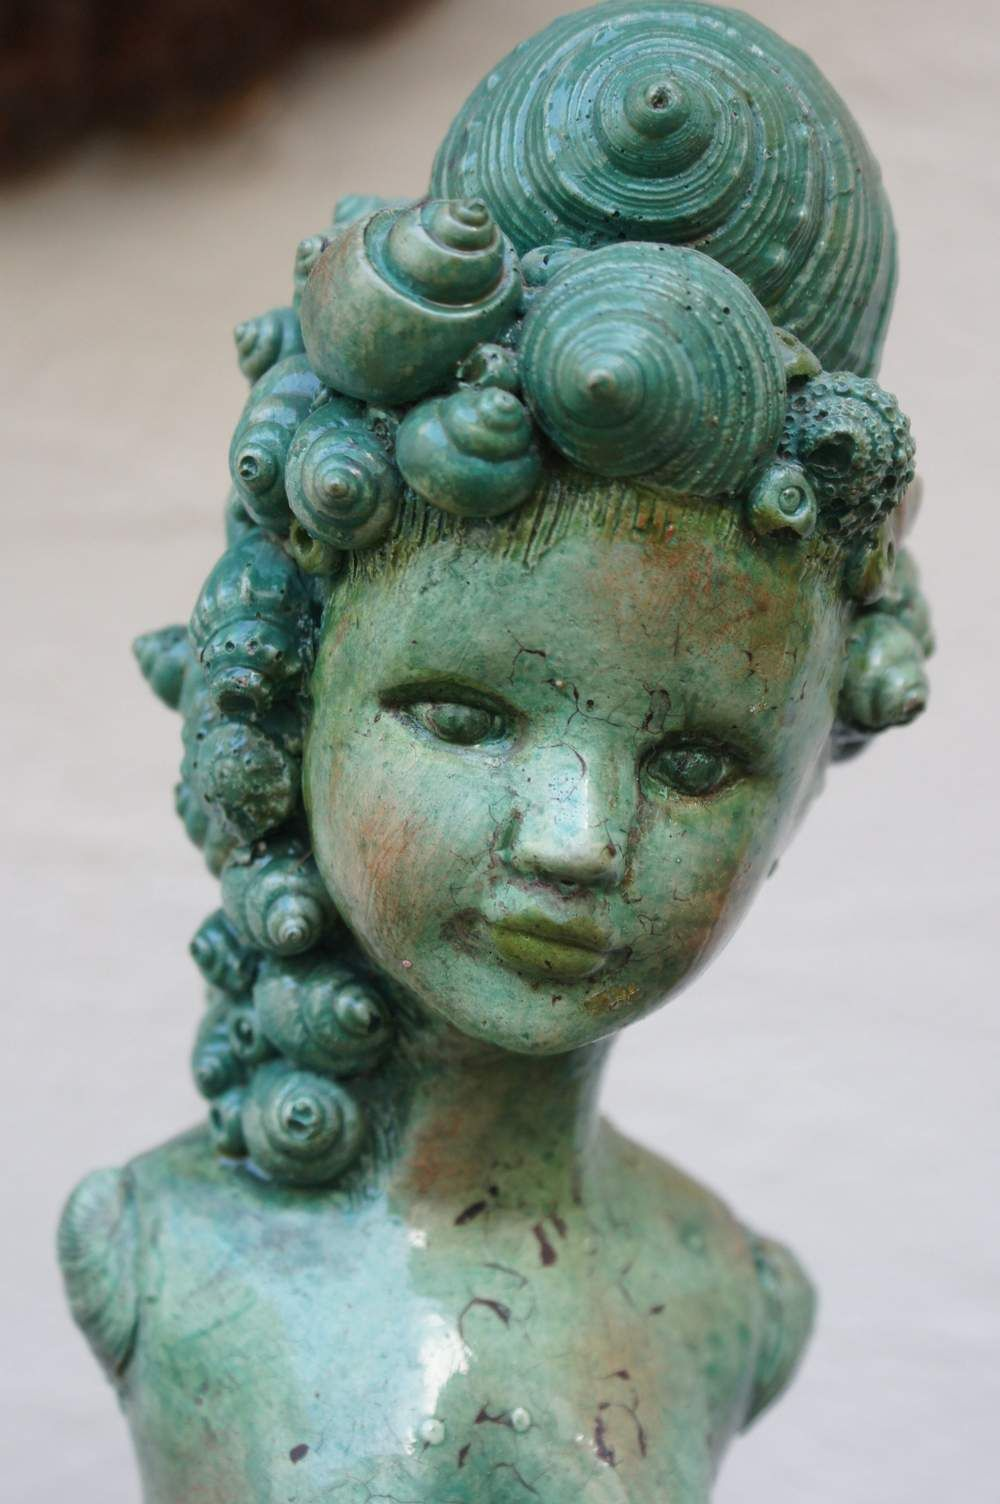 Gartenfiguren Skulptur Meerjungfrau Garten Gartenfigur Ein Designerstuck Von Mandagora Bei Dawanda Statuen Skulpturen Beton Kunst